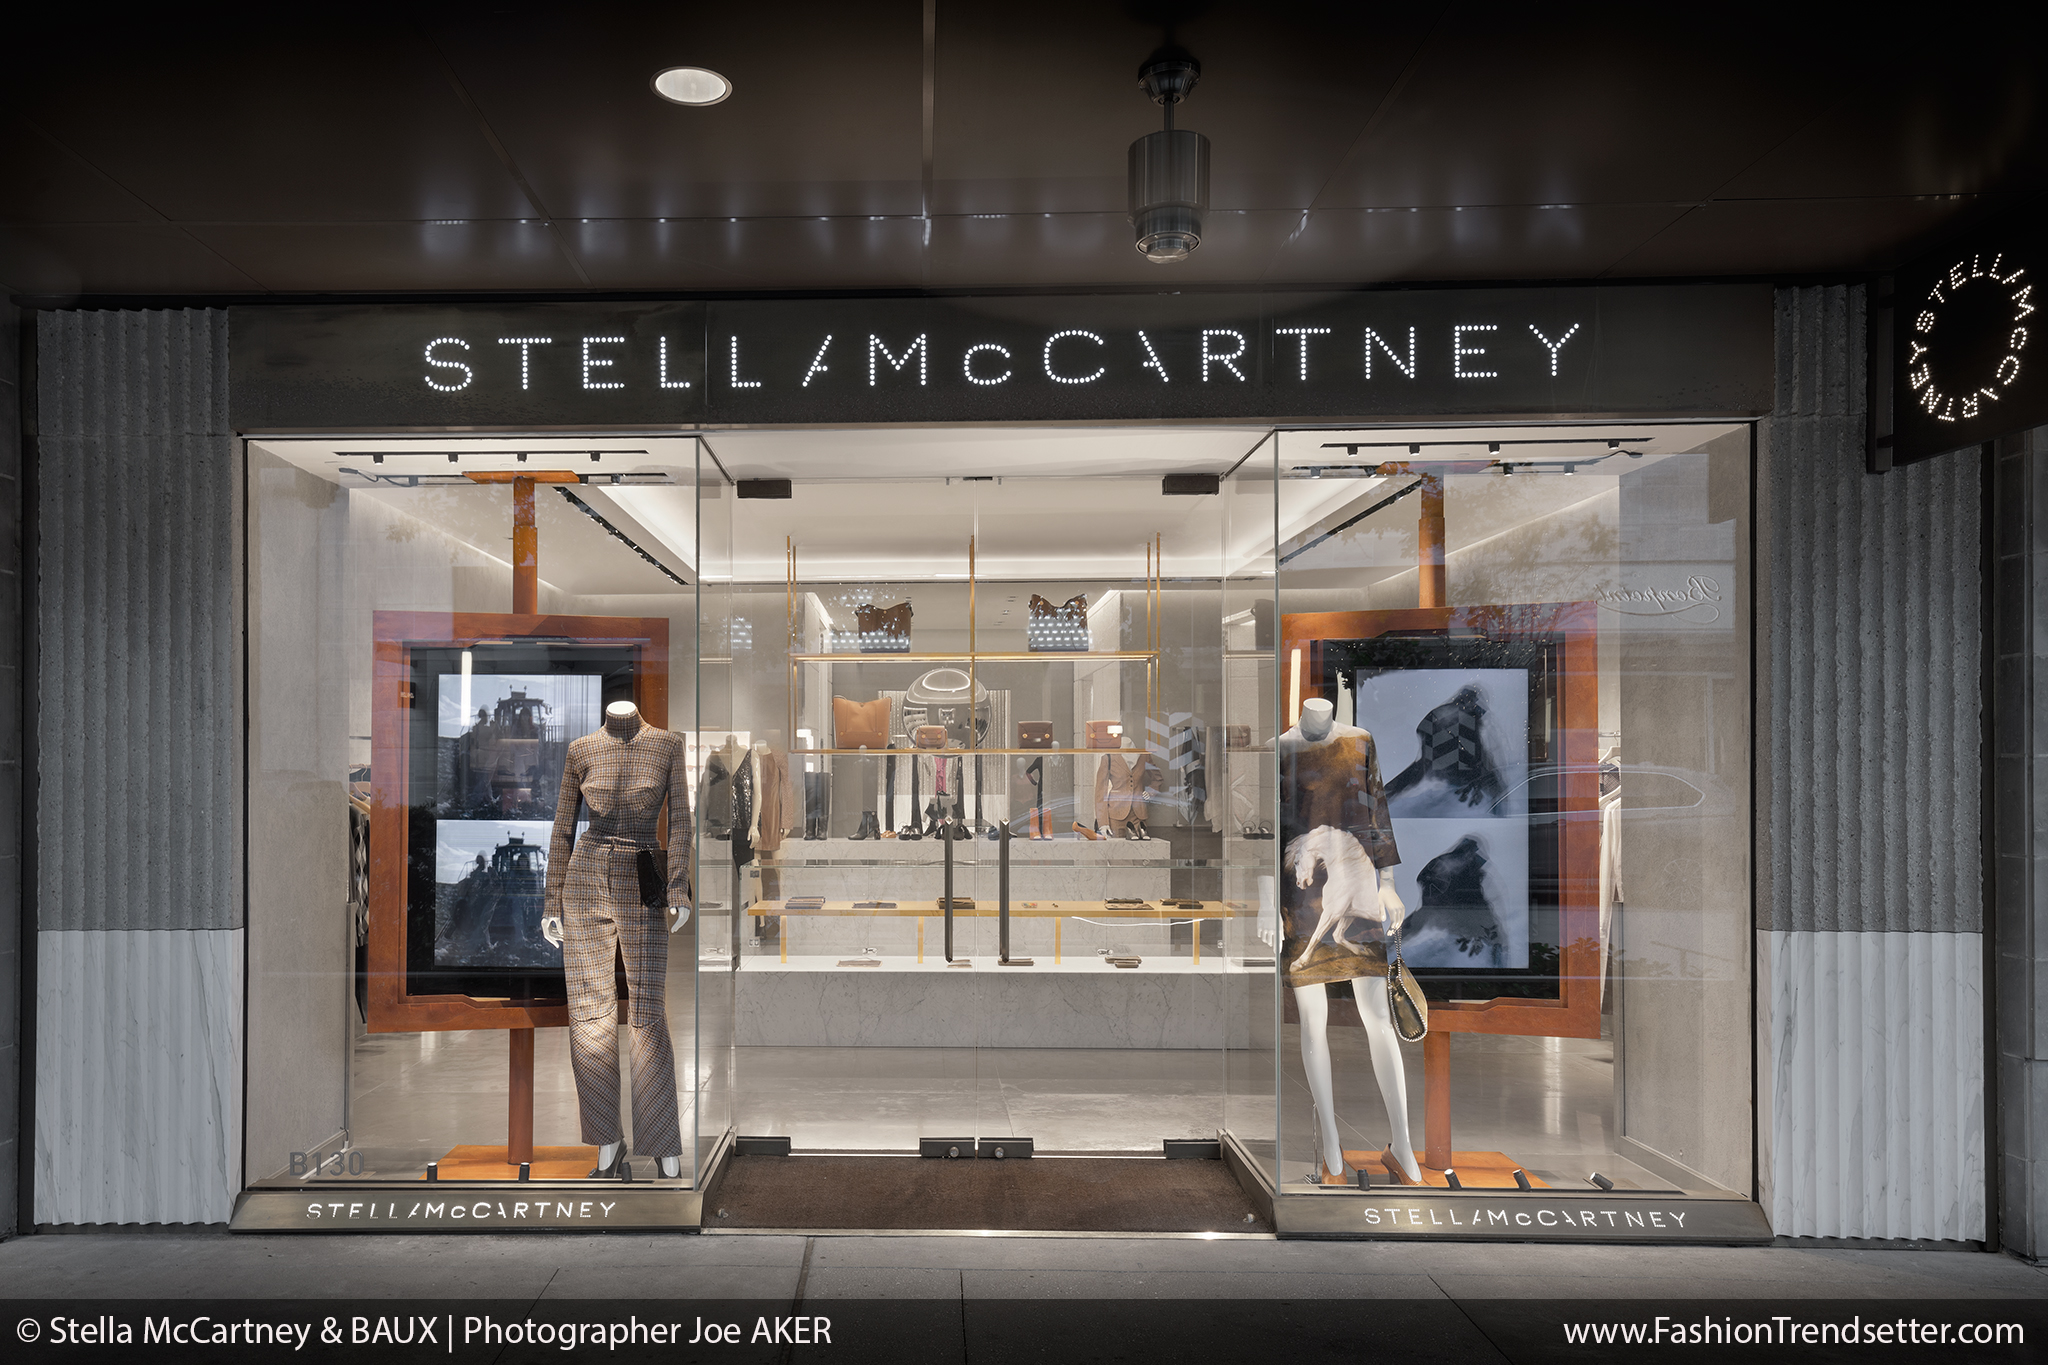 BAUX & Stella McCartney: Beautiful Sustainable Design